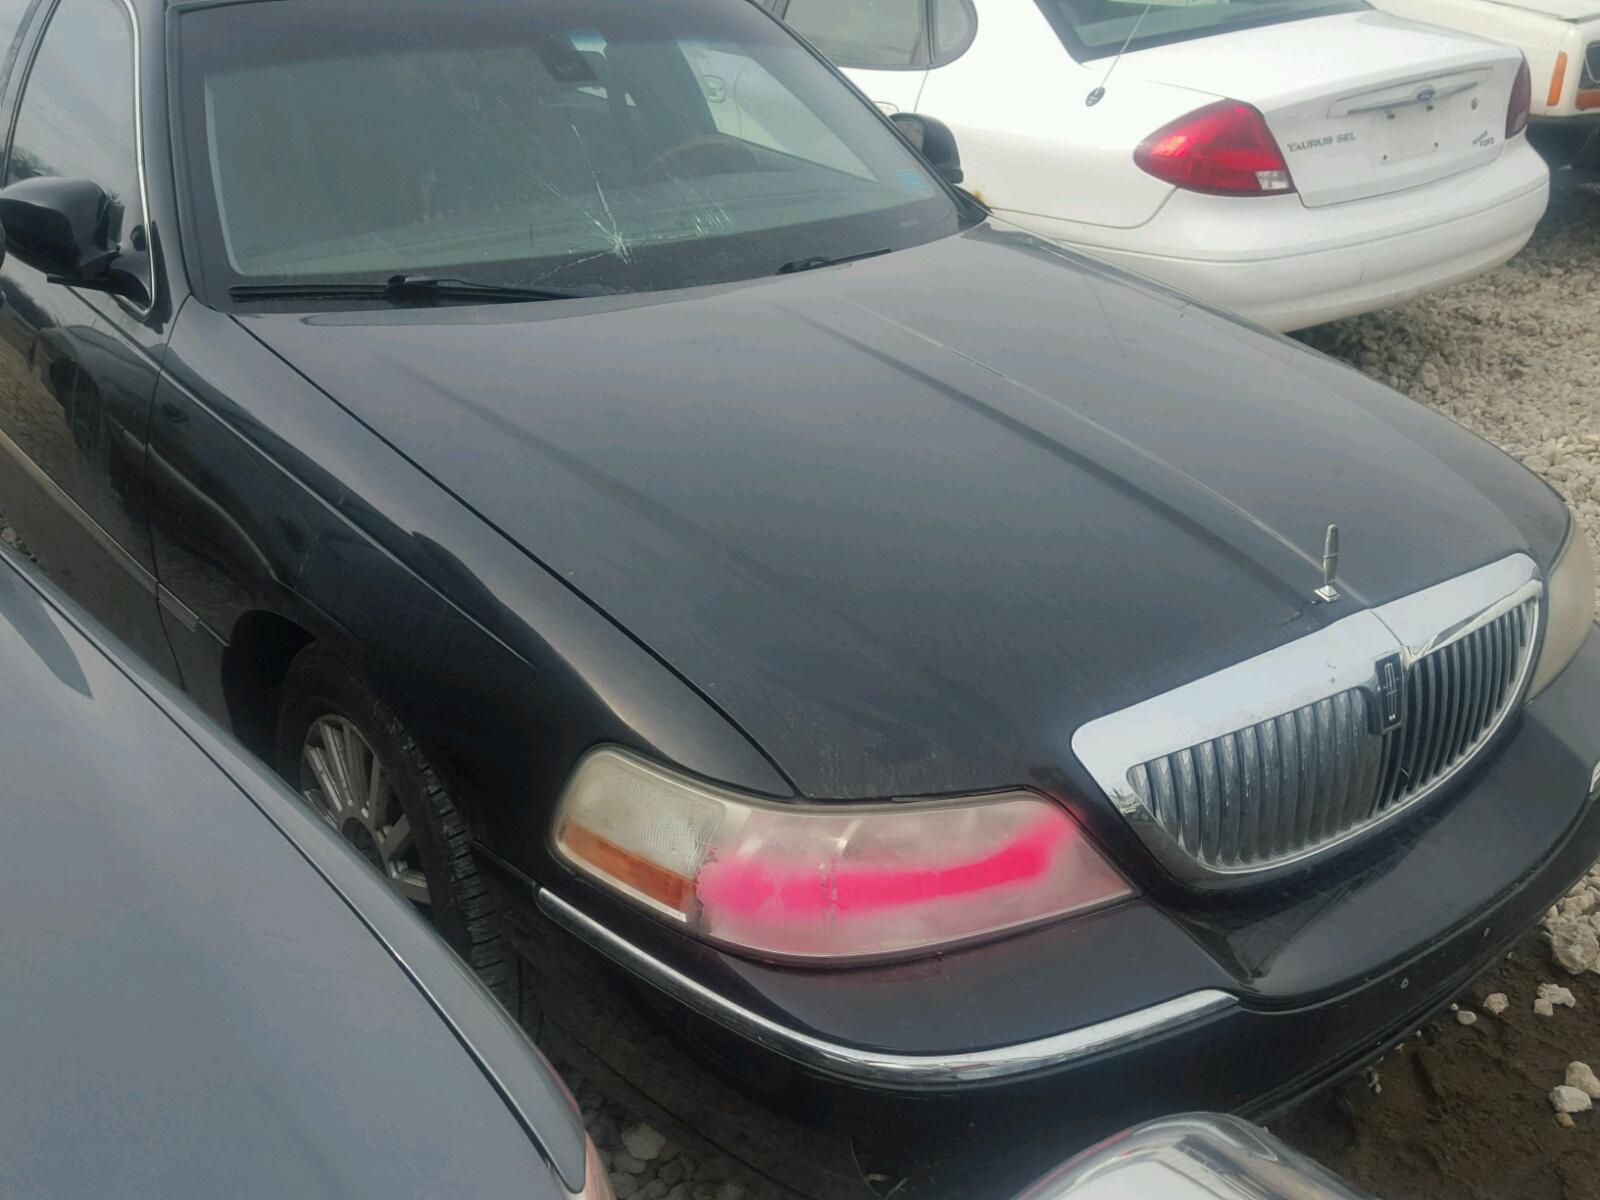 1lnhm85w73y664140 2003 Black Lincoln Town Car C On Sale In Mn 46l Left View